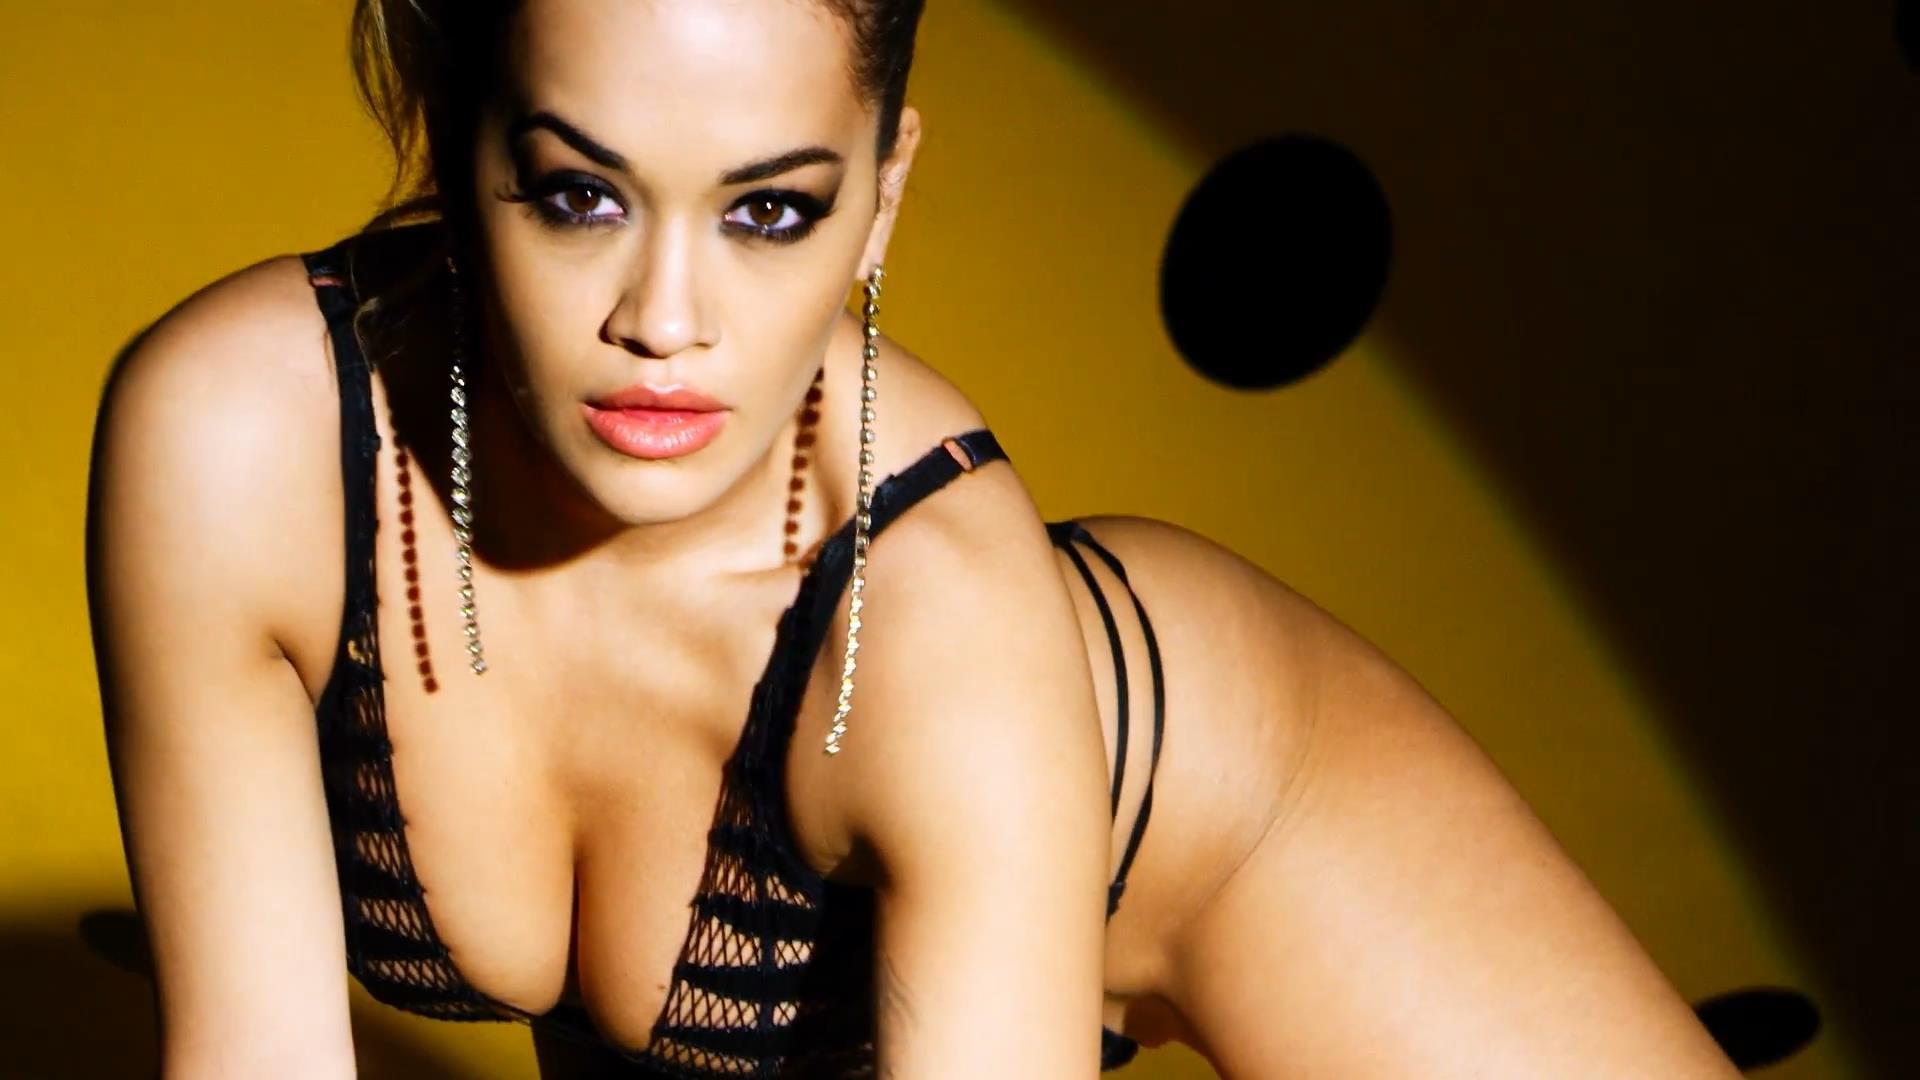 samie-seksualnie-aktrisi-foto